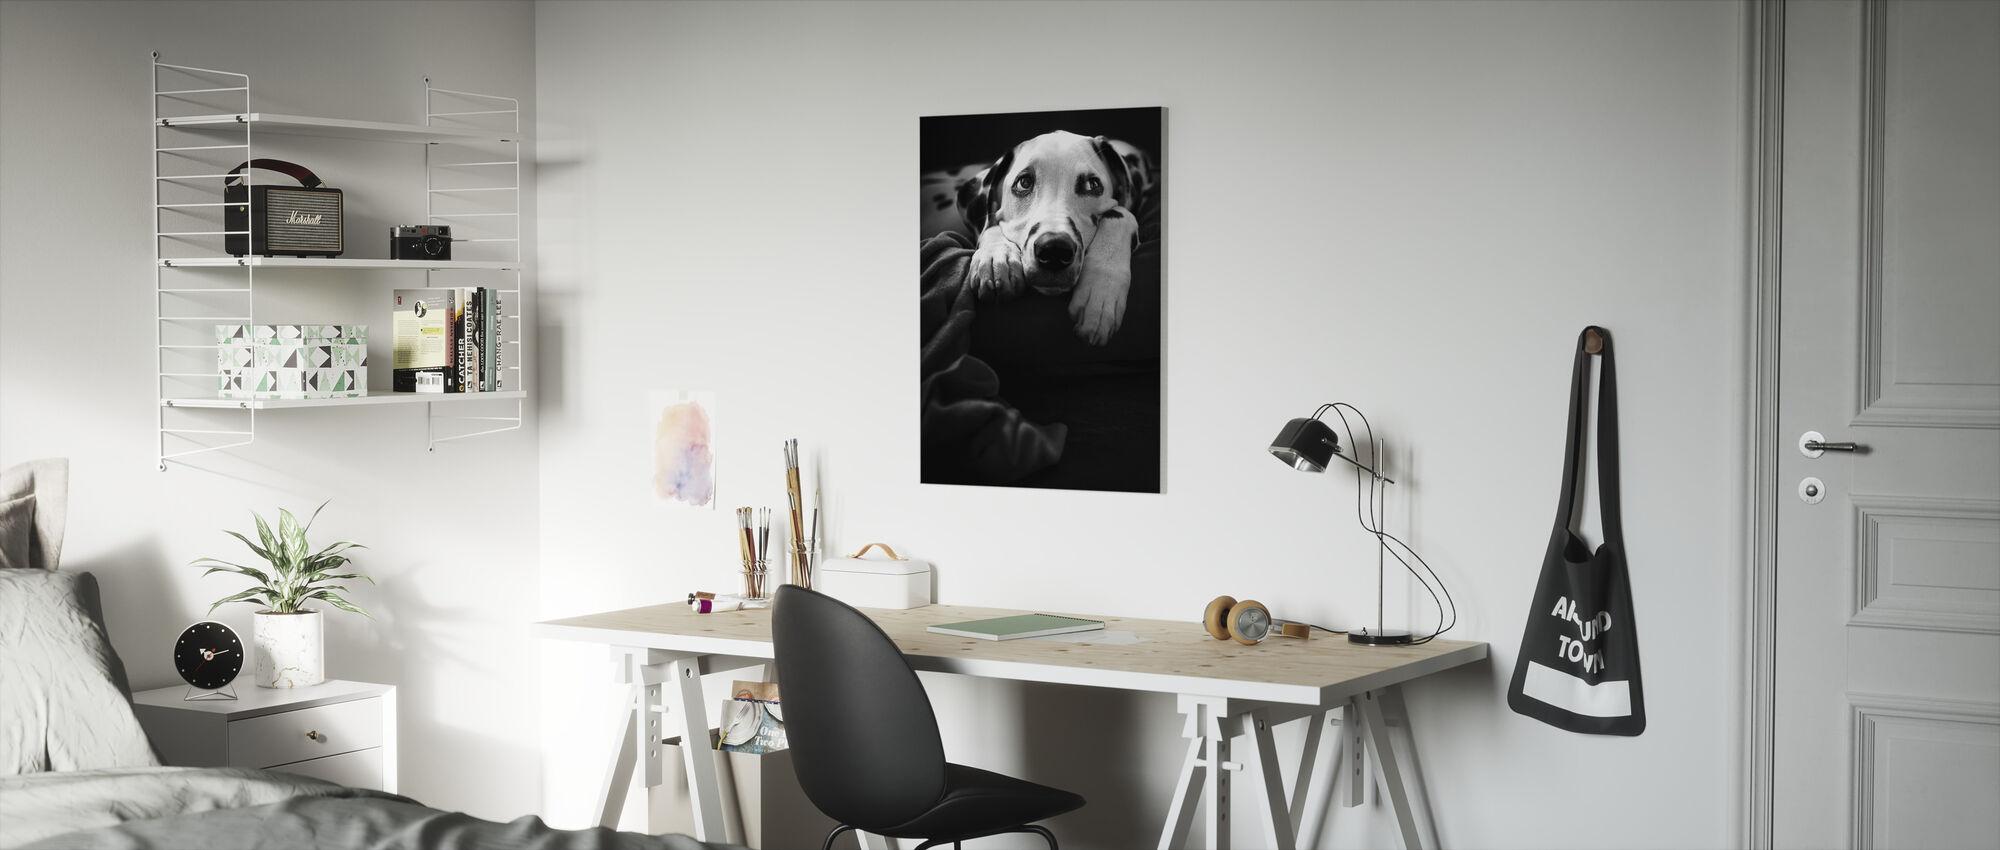 nothing is happening :-( - Canvas print - Kids Room